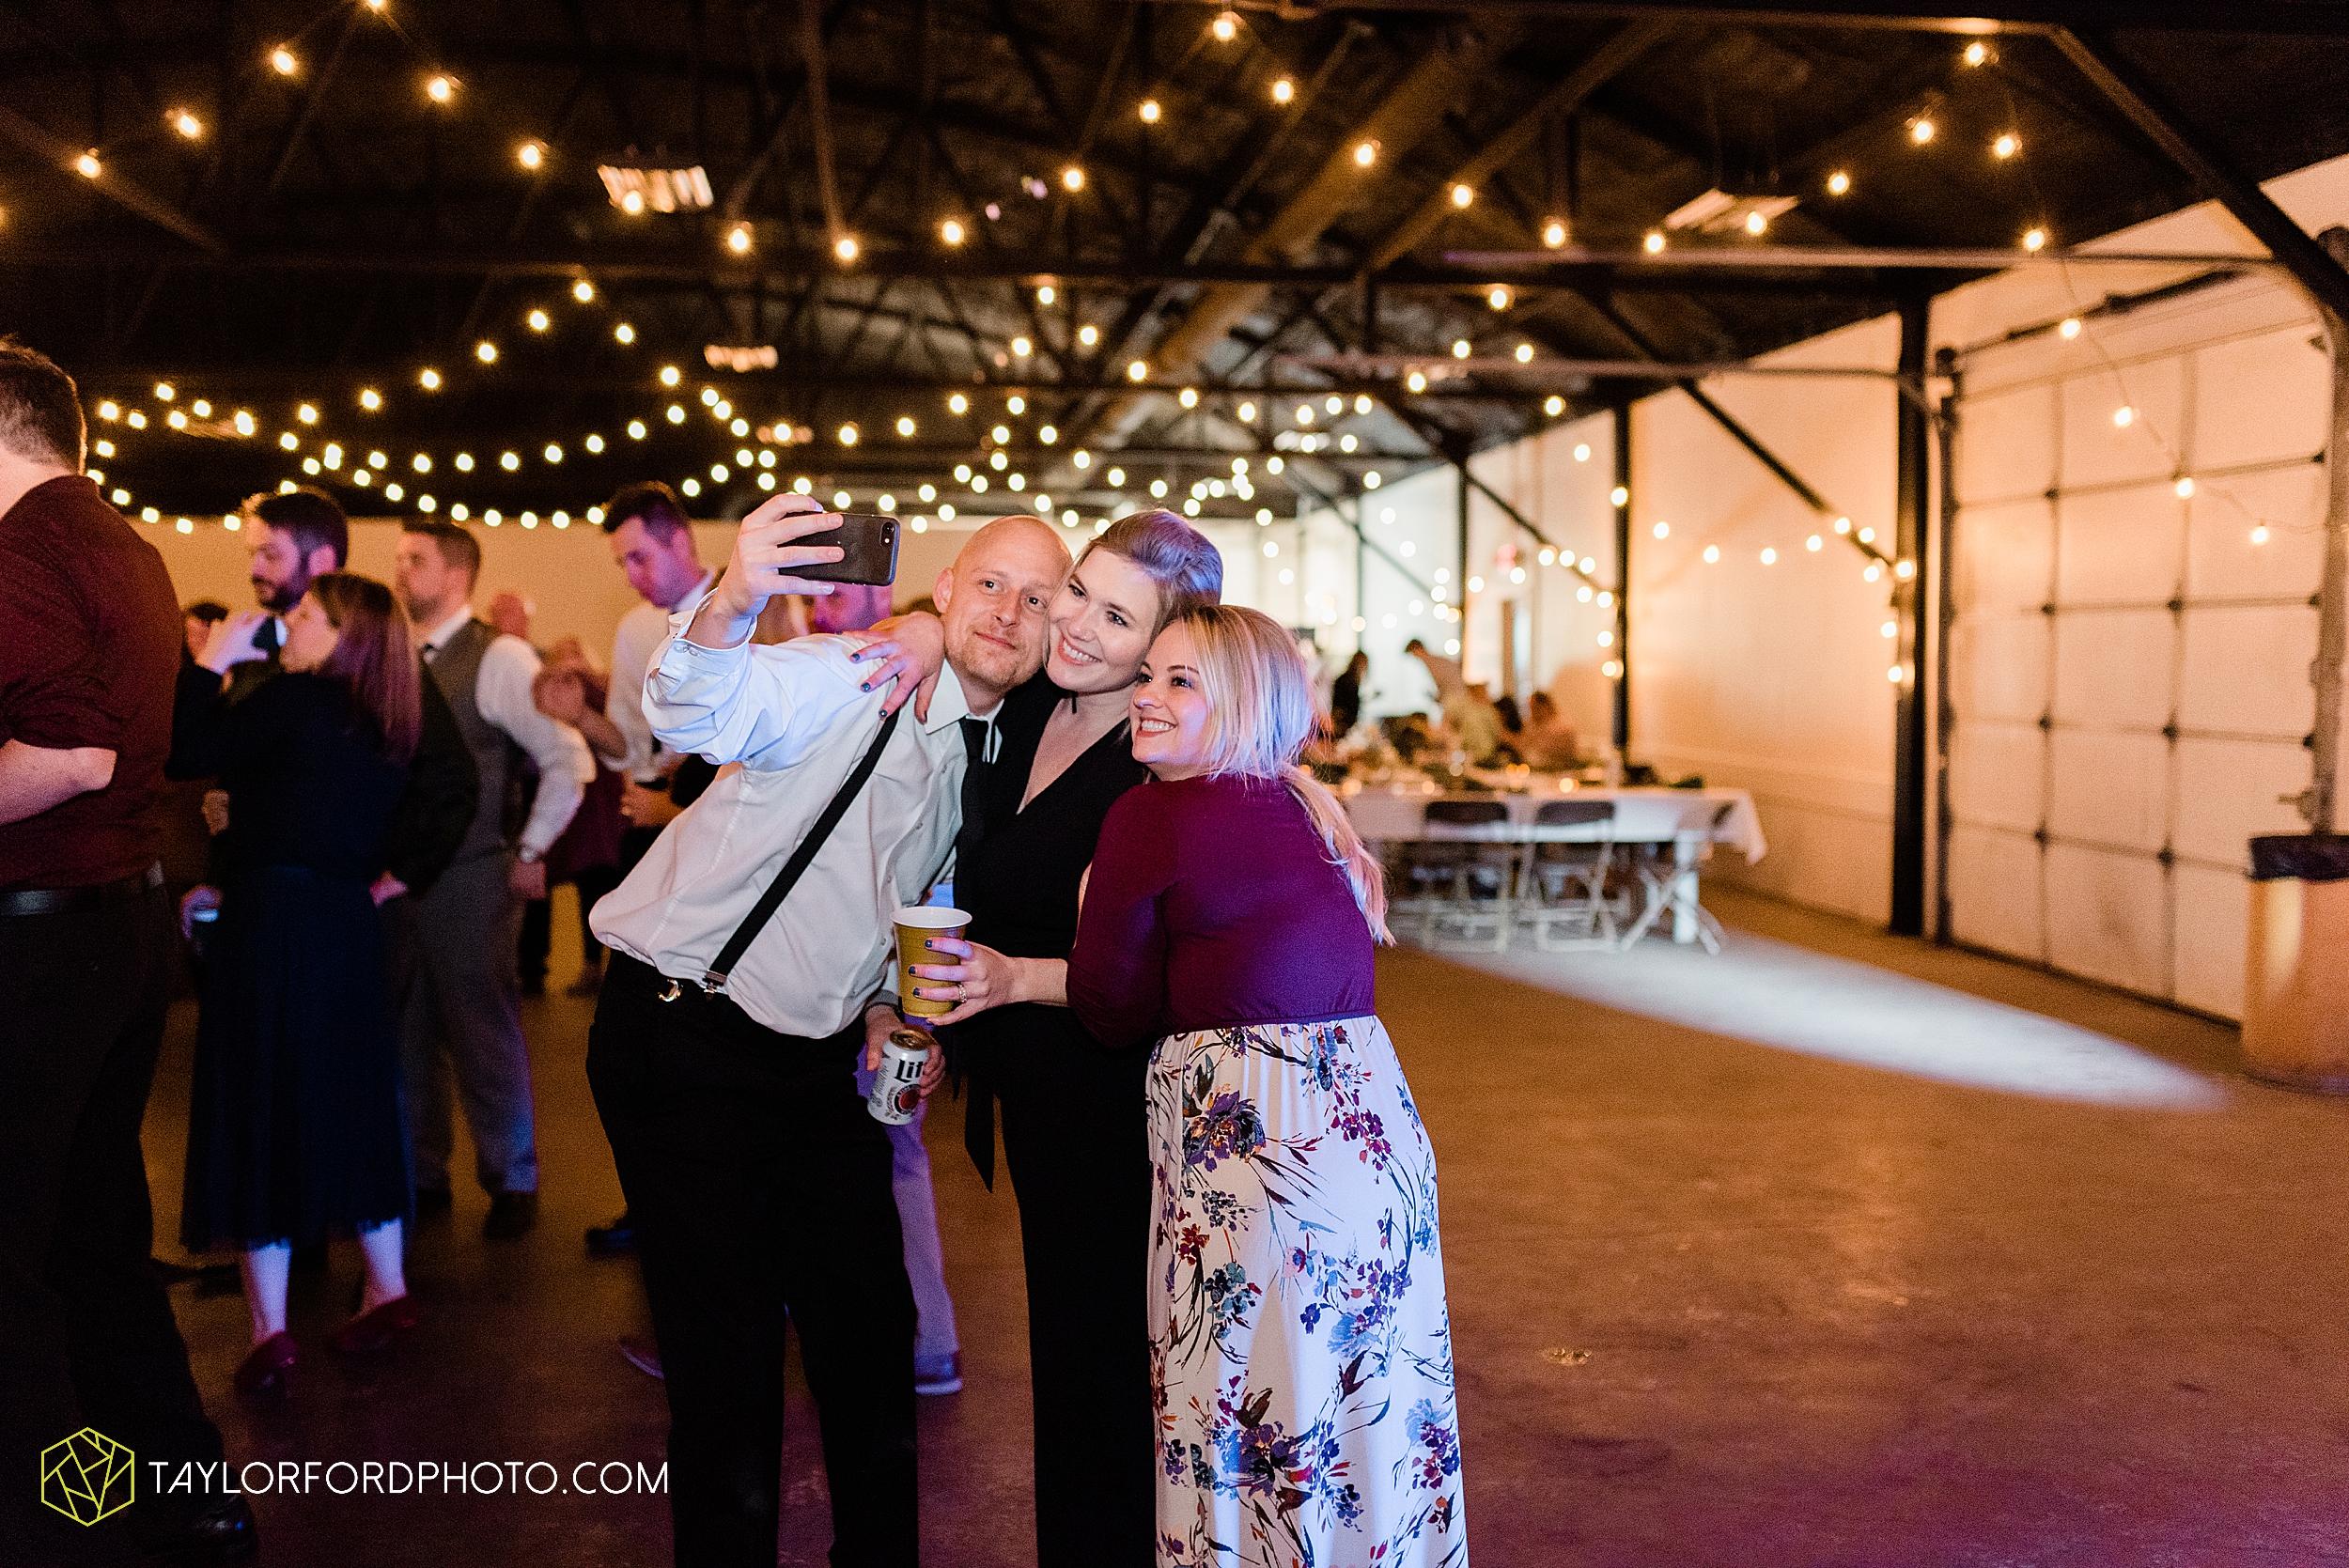 van-wert-ohio-first-united-methodist-downtown-van-wert-county-jr-fair-building-reception-winter-christmas-wedding-photographer-taylor-ford-hirschy-photographer-taylor-ford-hirschy-photographer_1969.jpg